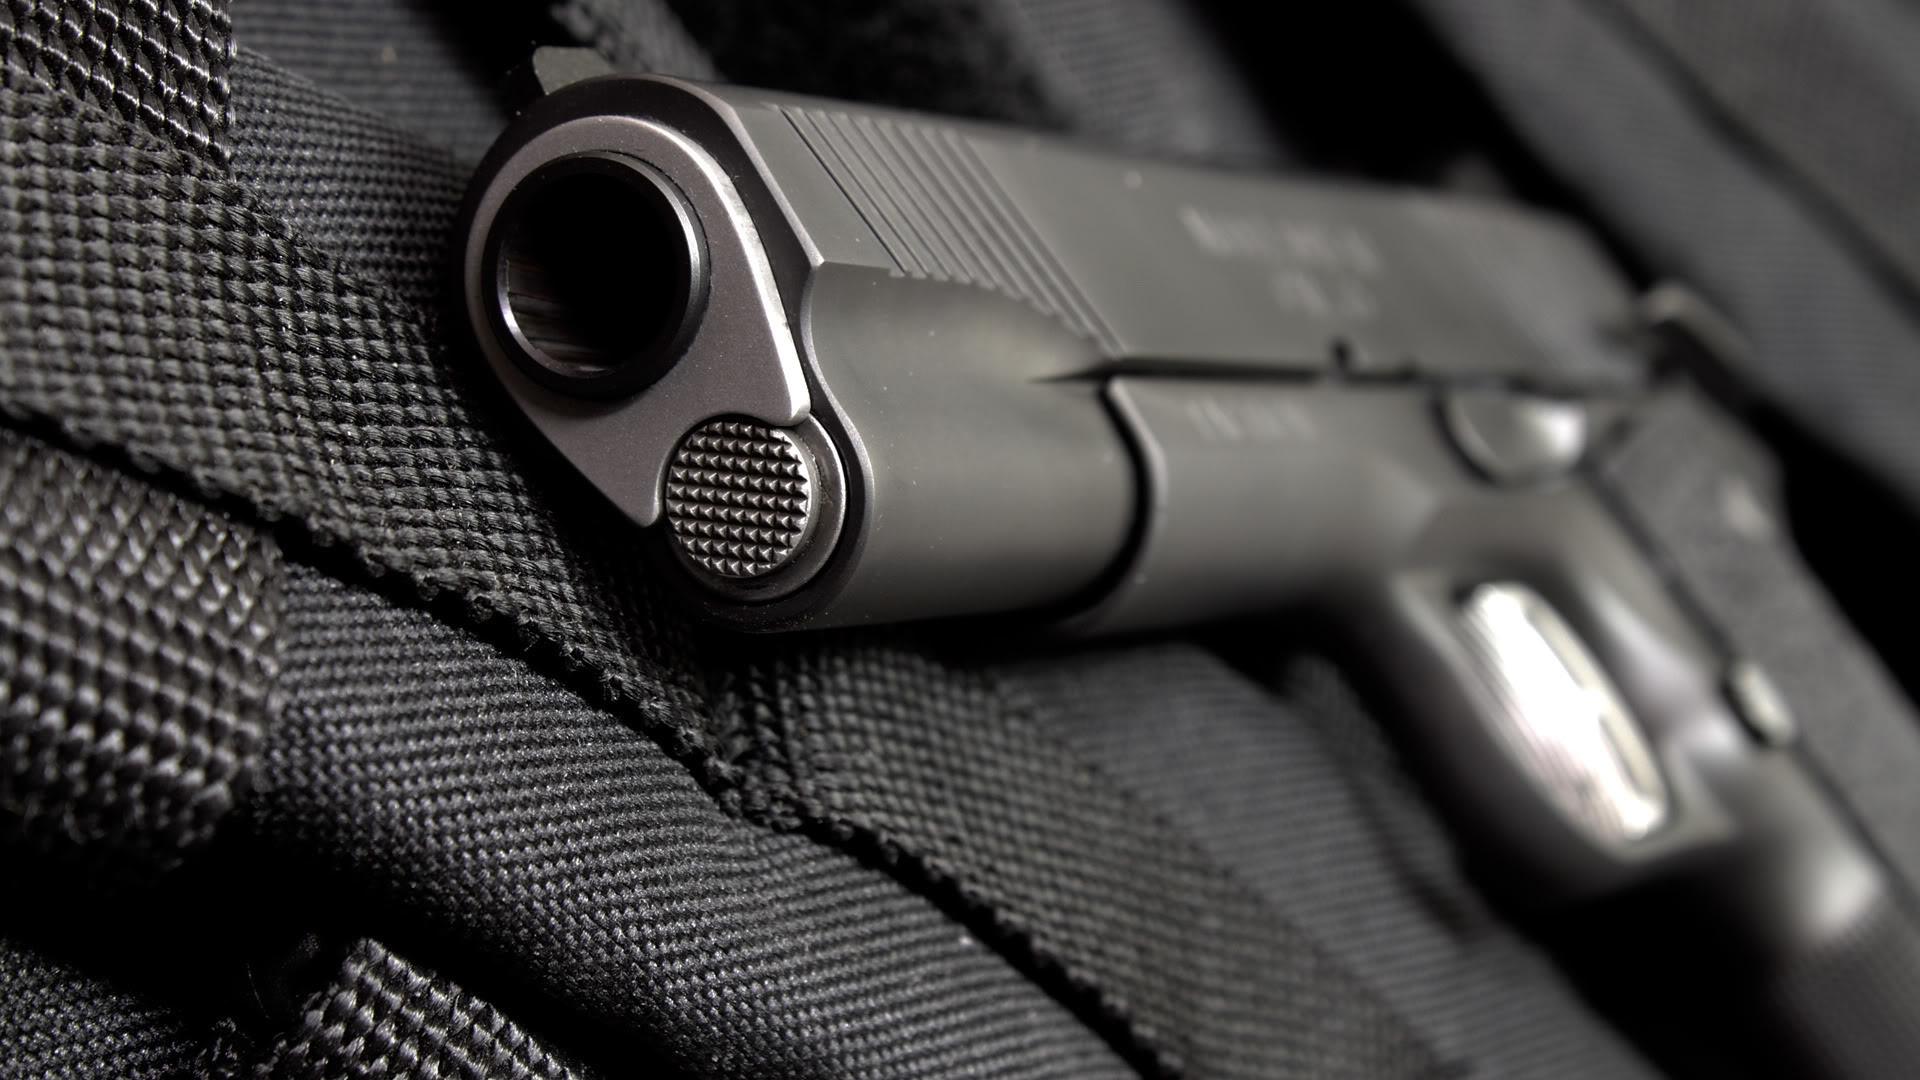 45ACP Guns M1911 Springfield Armory Weapons …